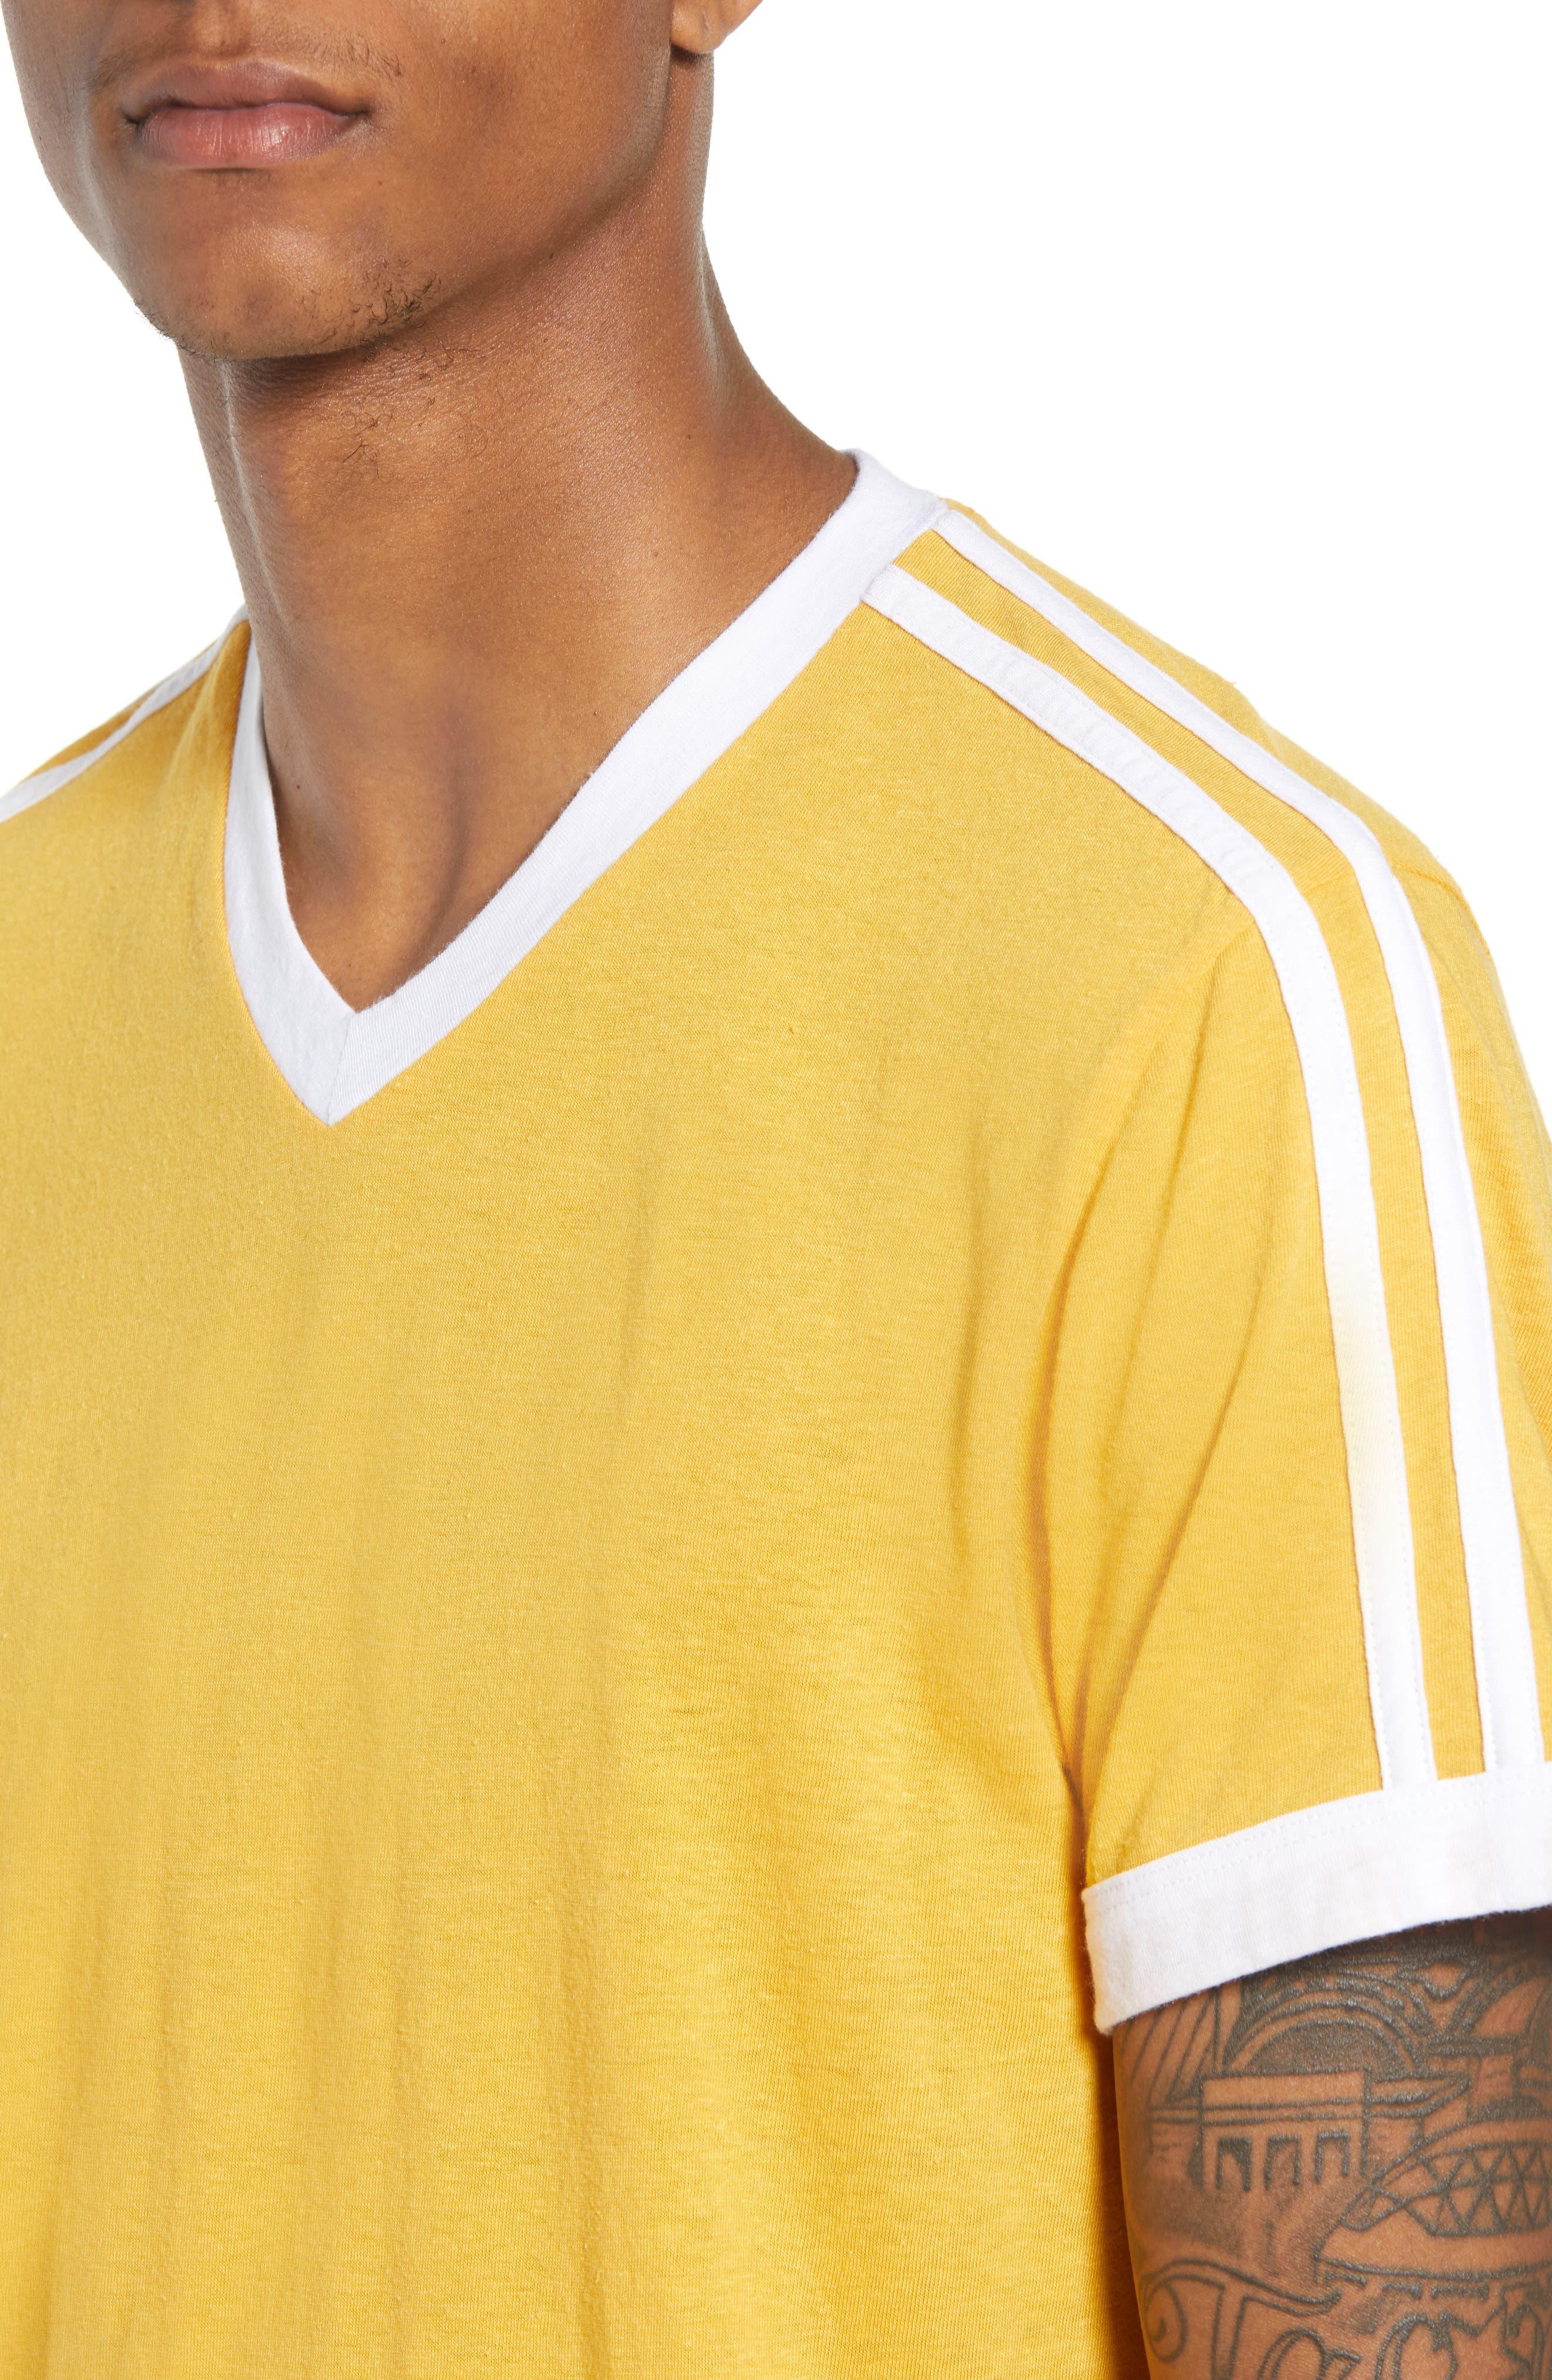 Vintage Athletic V-Neck T-Shirt,                             Alternate thumbnail 4, color,                             Yellow Mineral / White Stripe